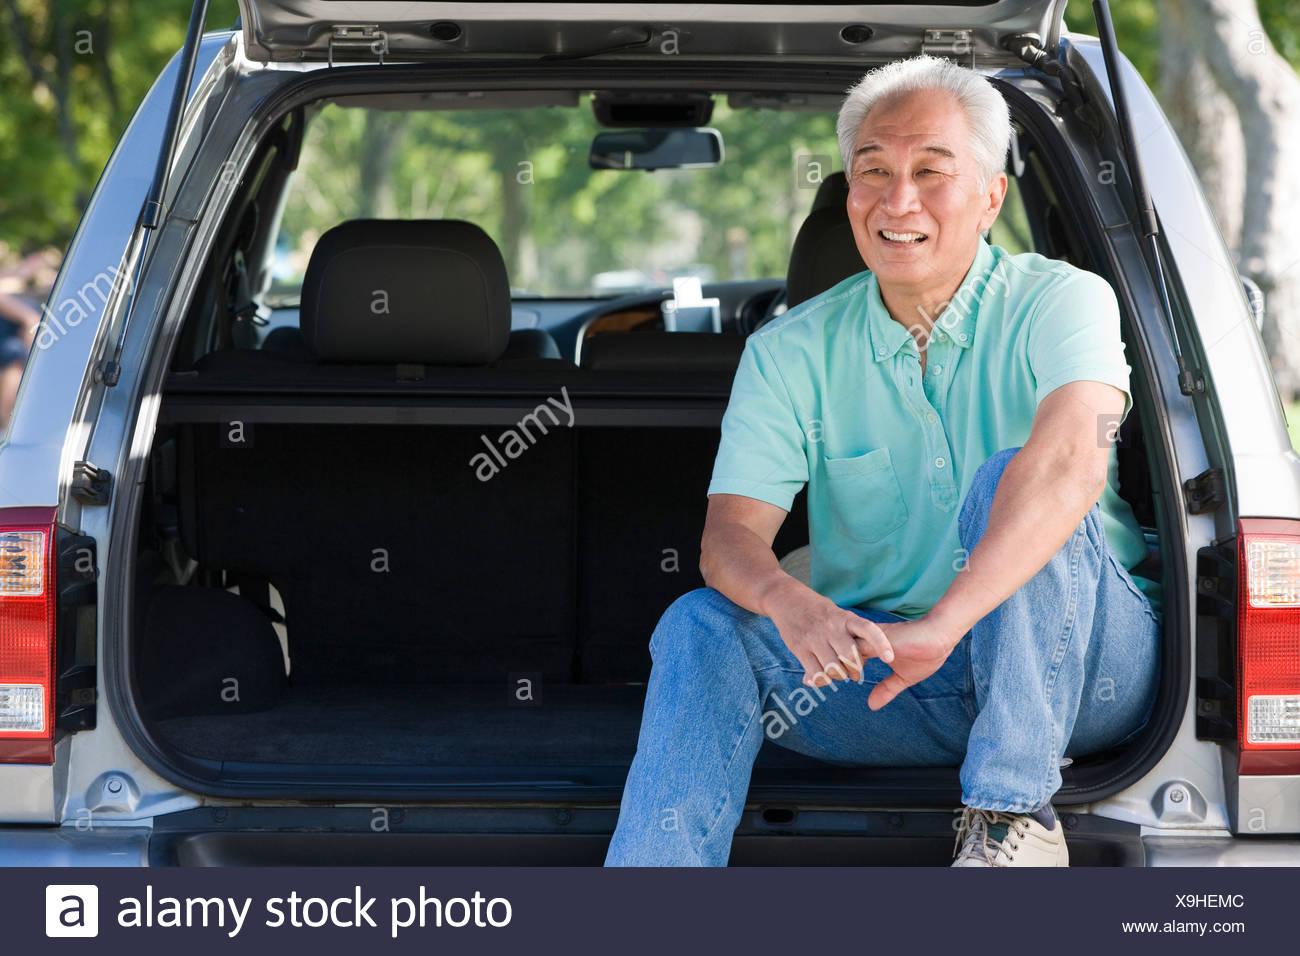 Man sitting in back of van smiling - Stock Image